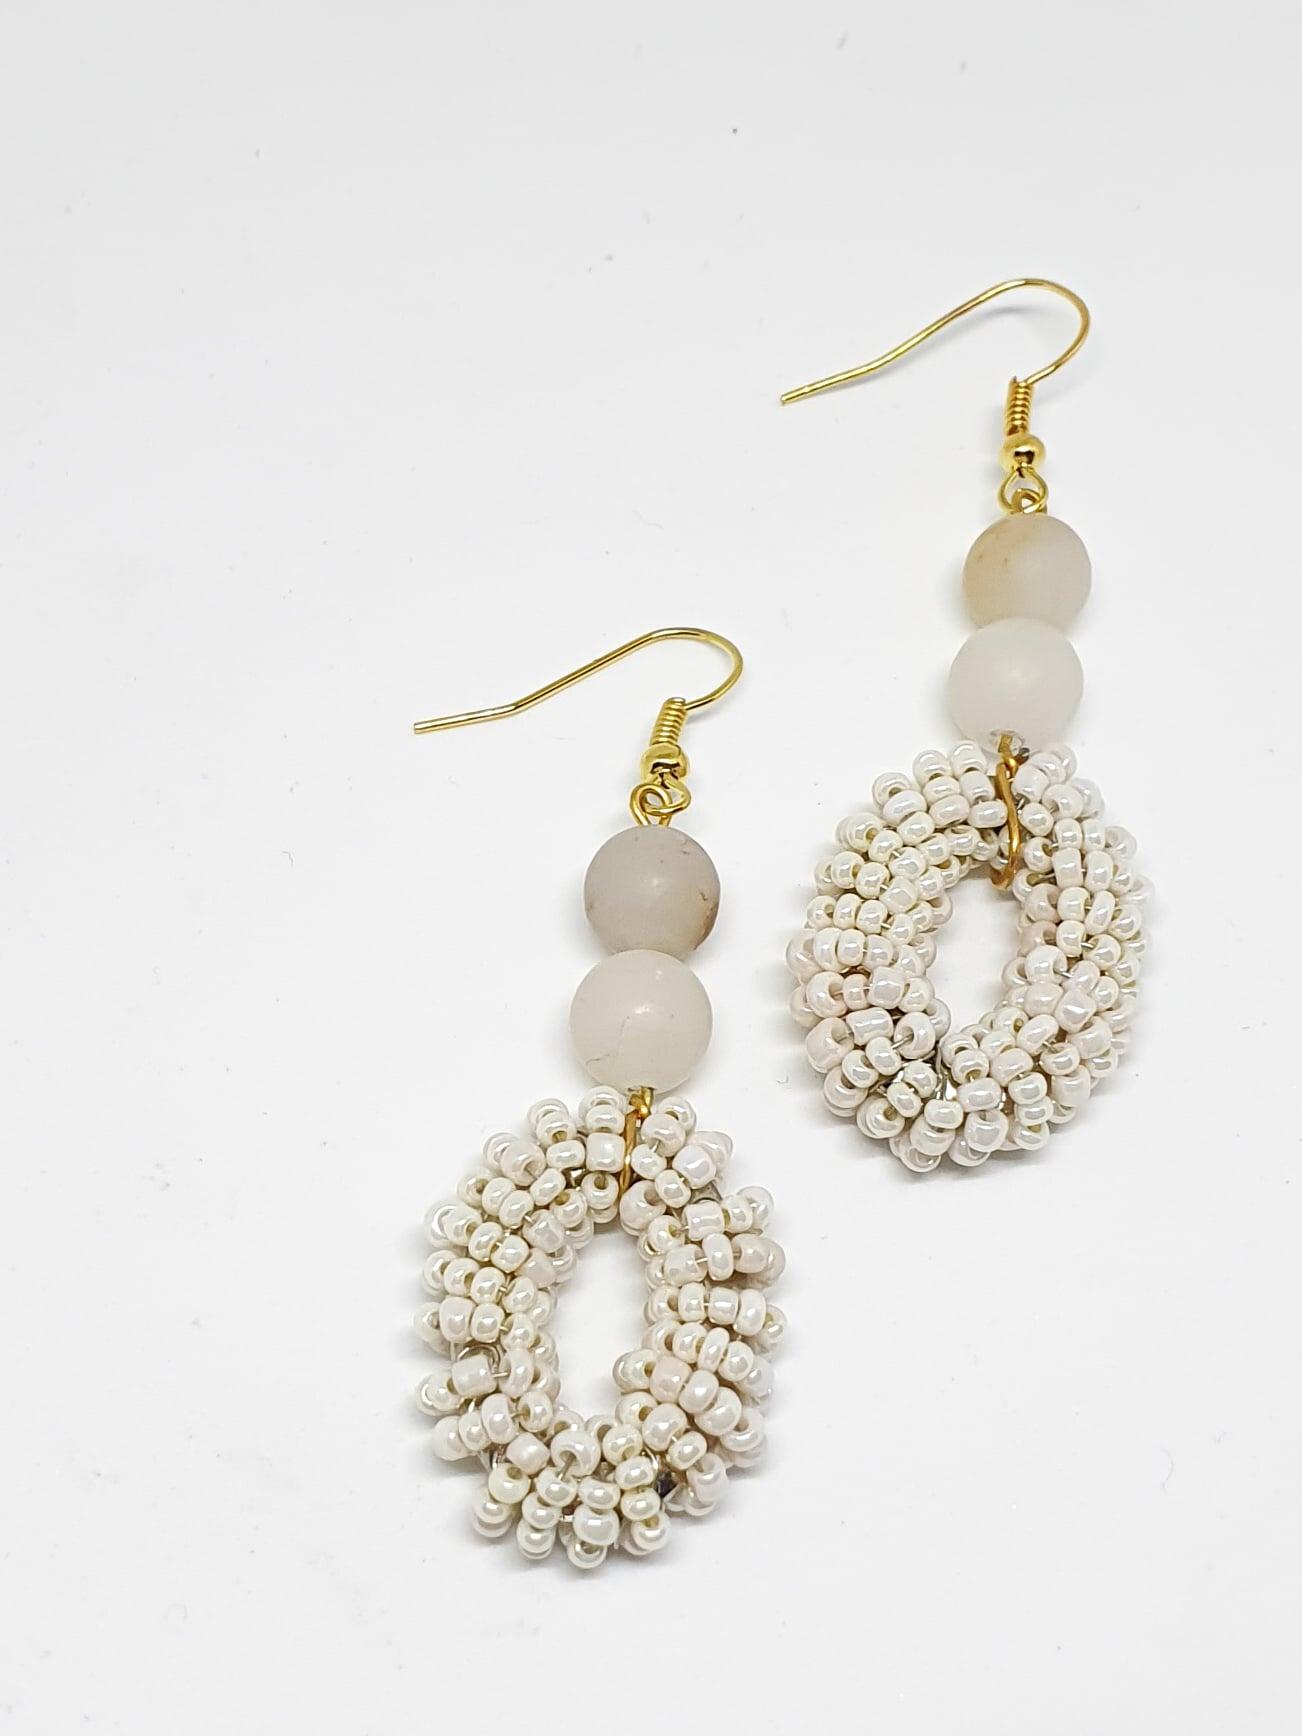 Bossa Earrings by Mereketé   Inspire Me Latin America